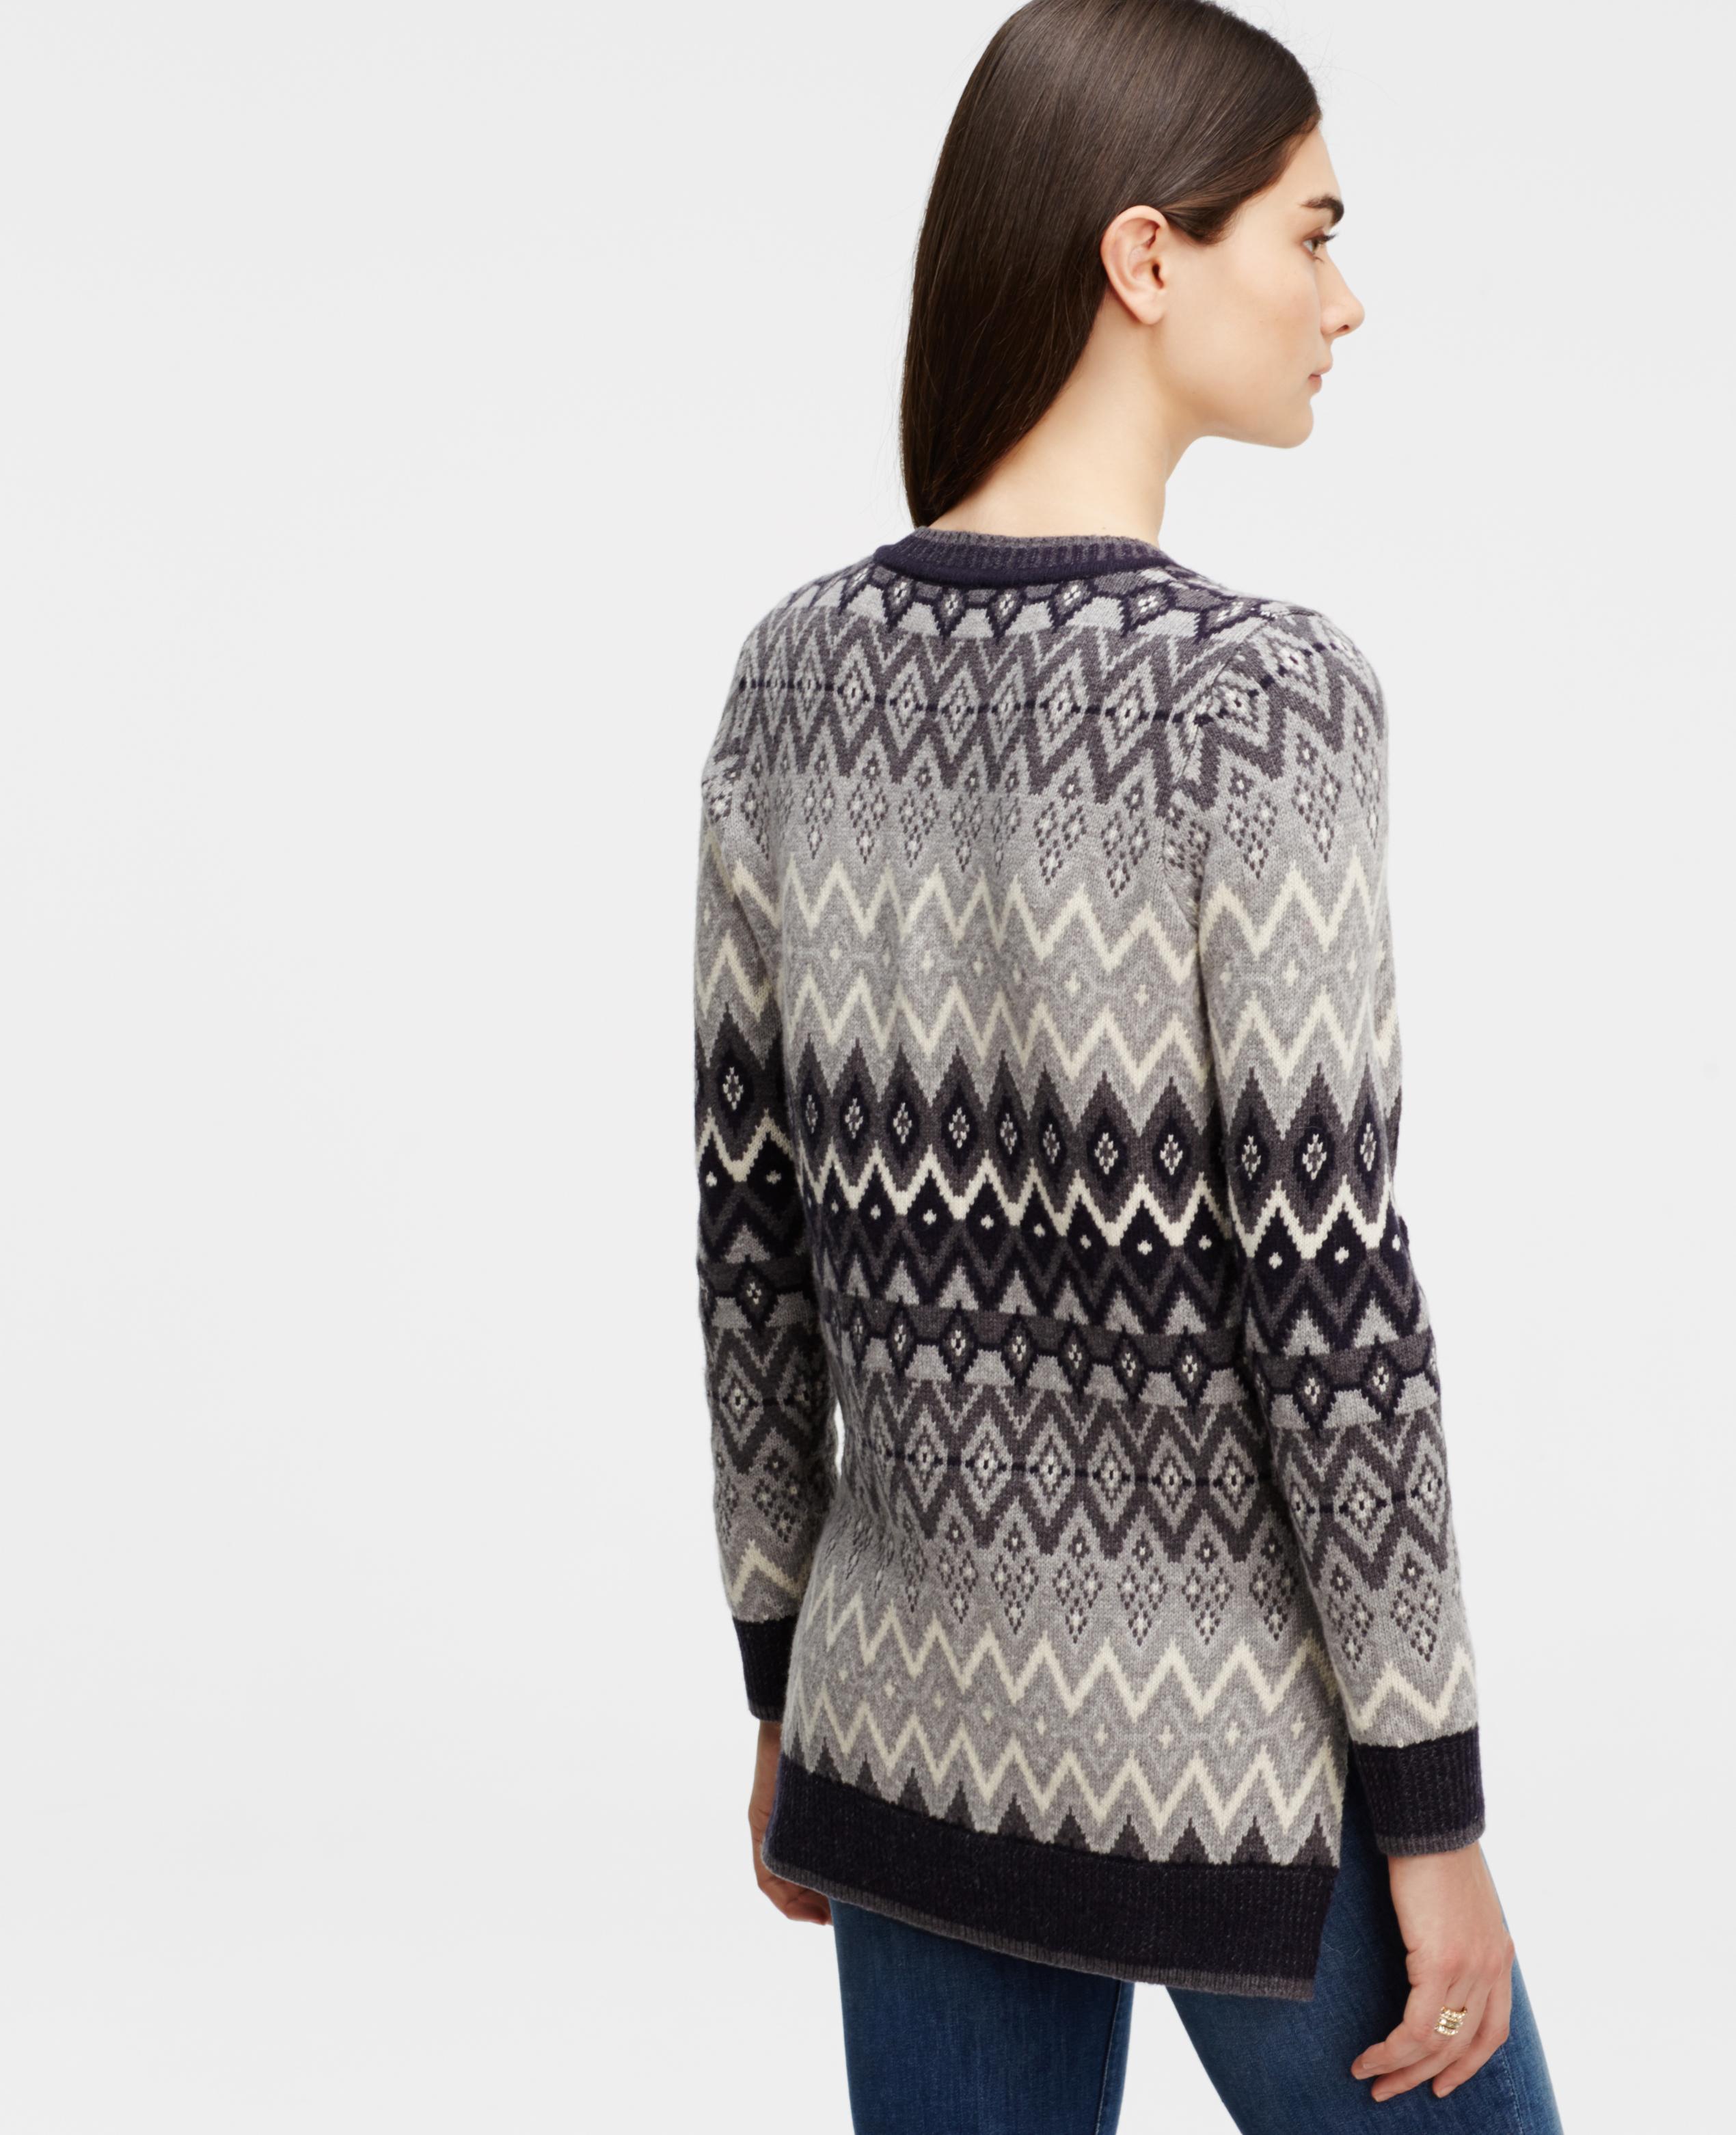 Ann taylor Fairisle Tunic Sweater in Natural | Lyst